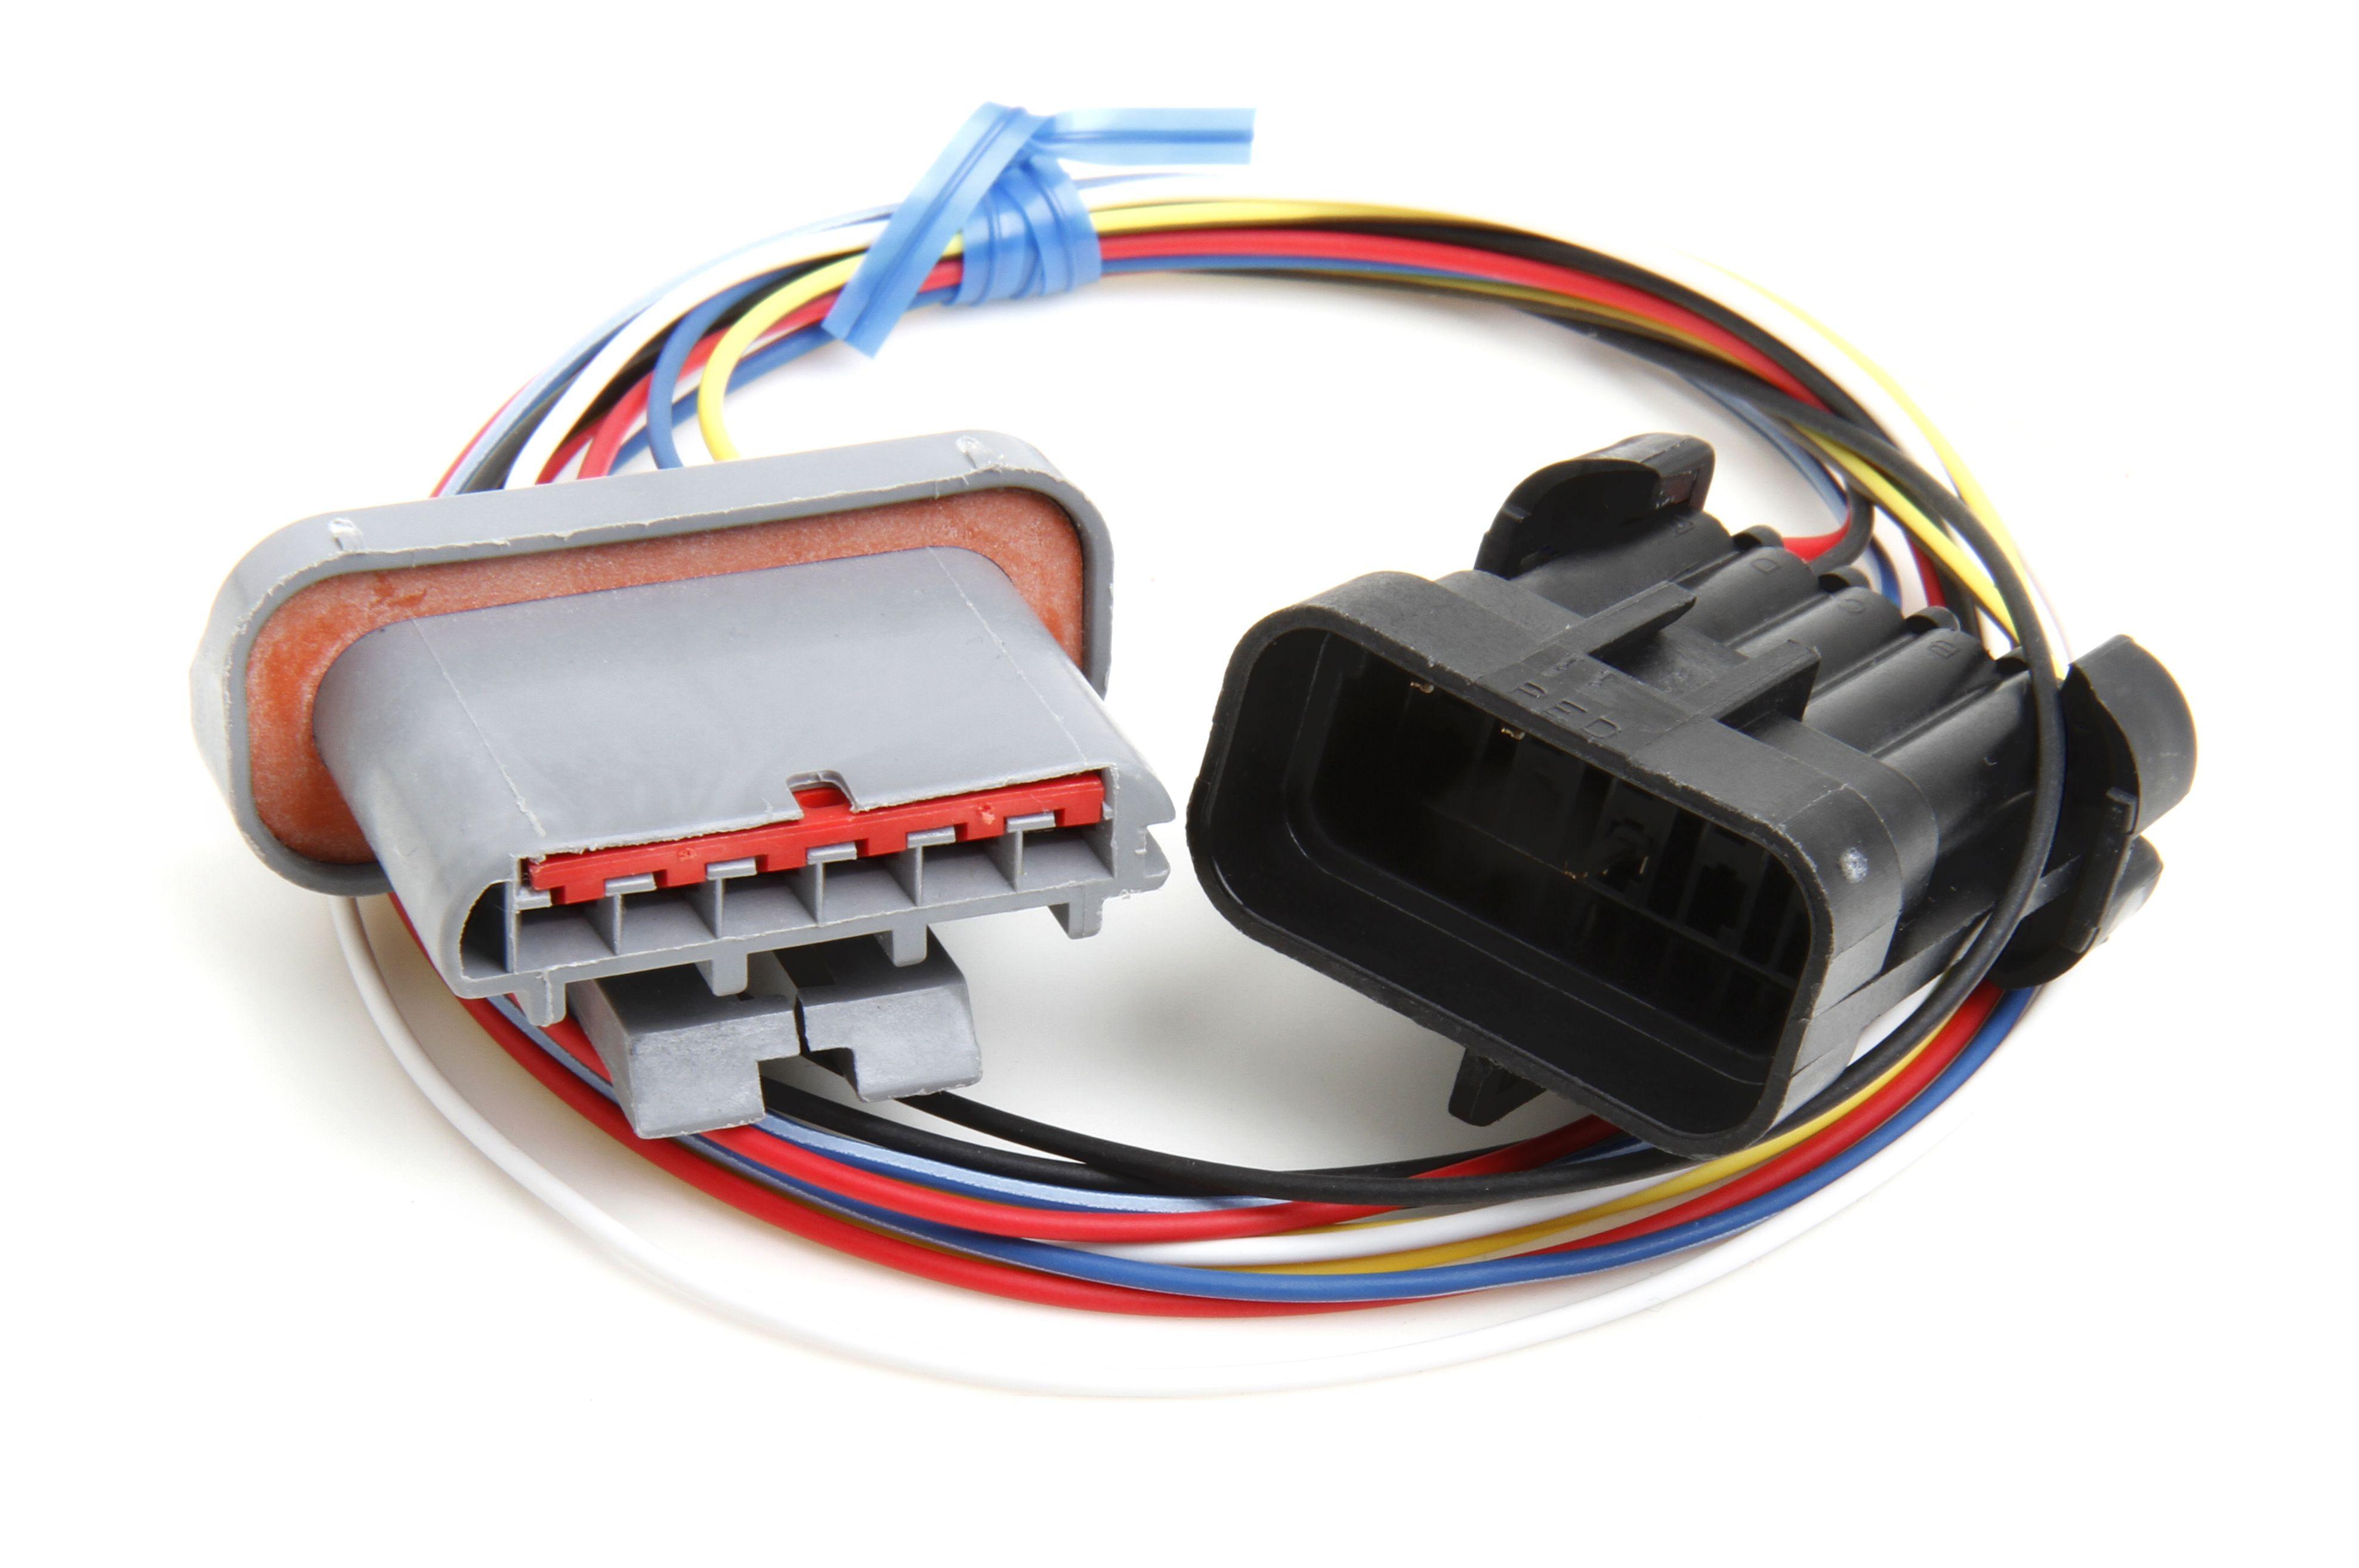 Tfi Module Wiring Diagram On Ford Tfi Ignition Module Wiring Diagram